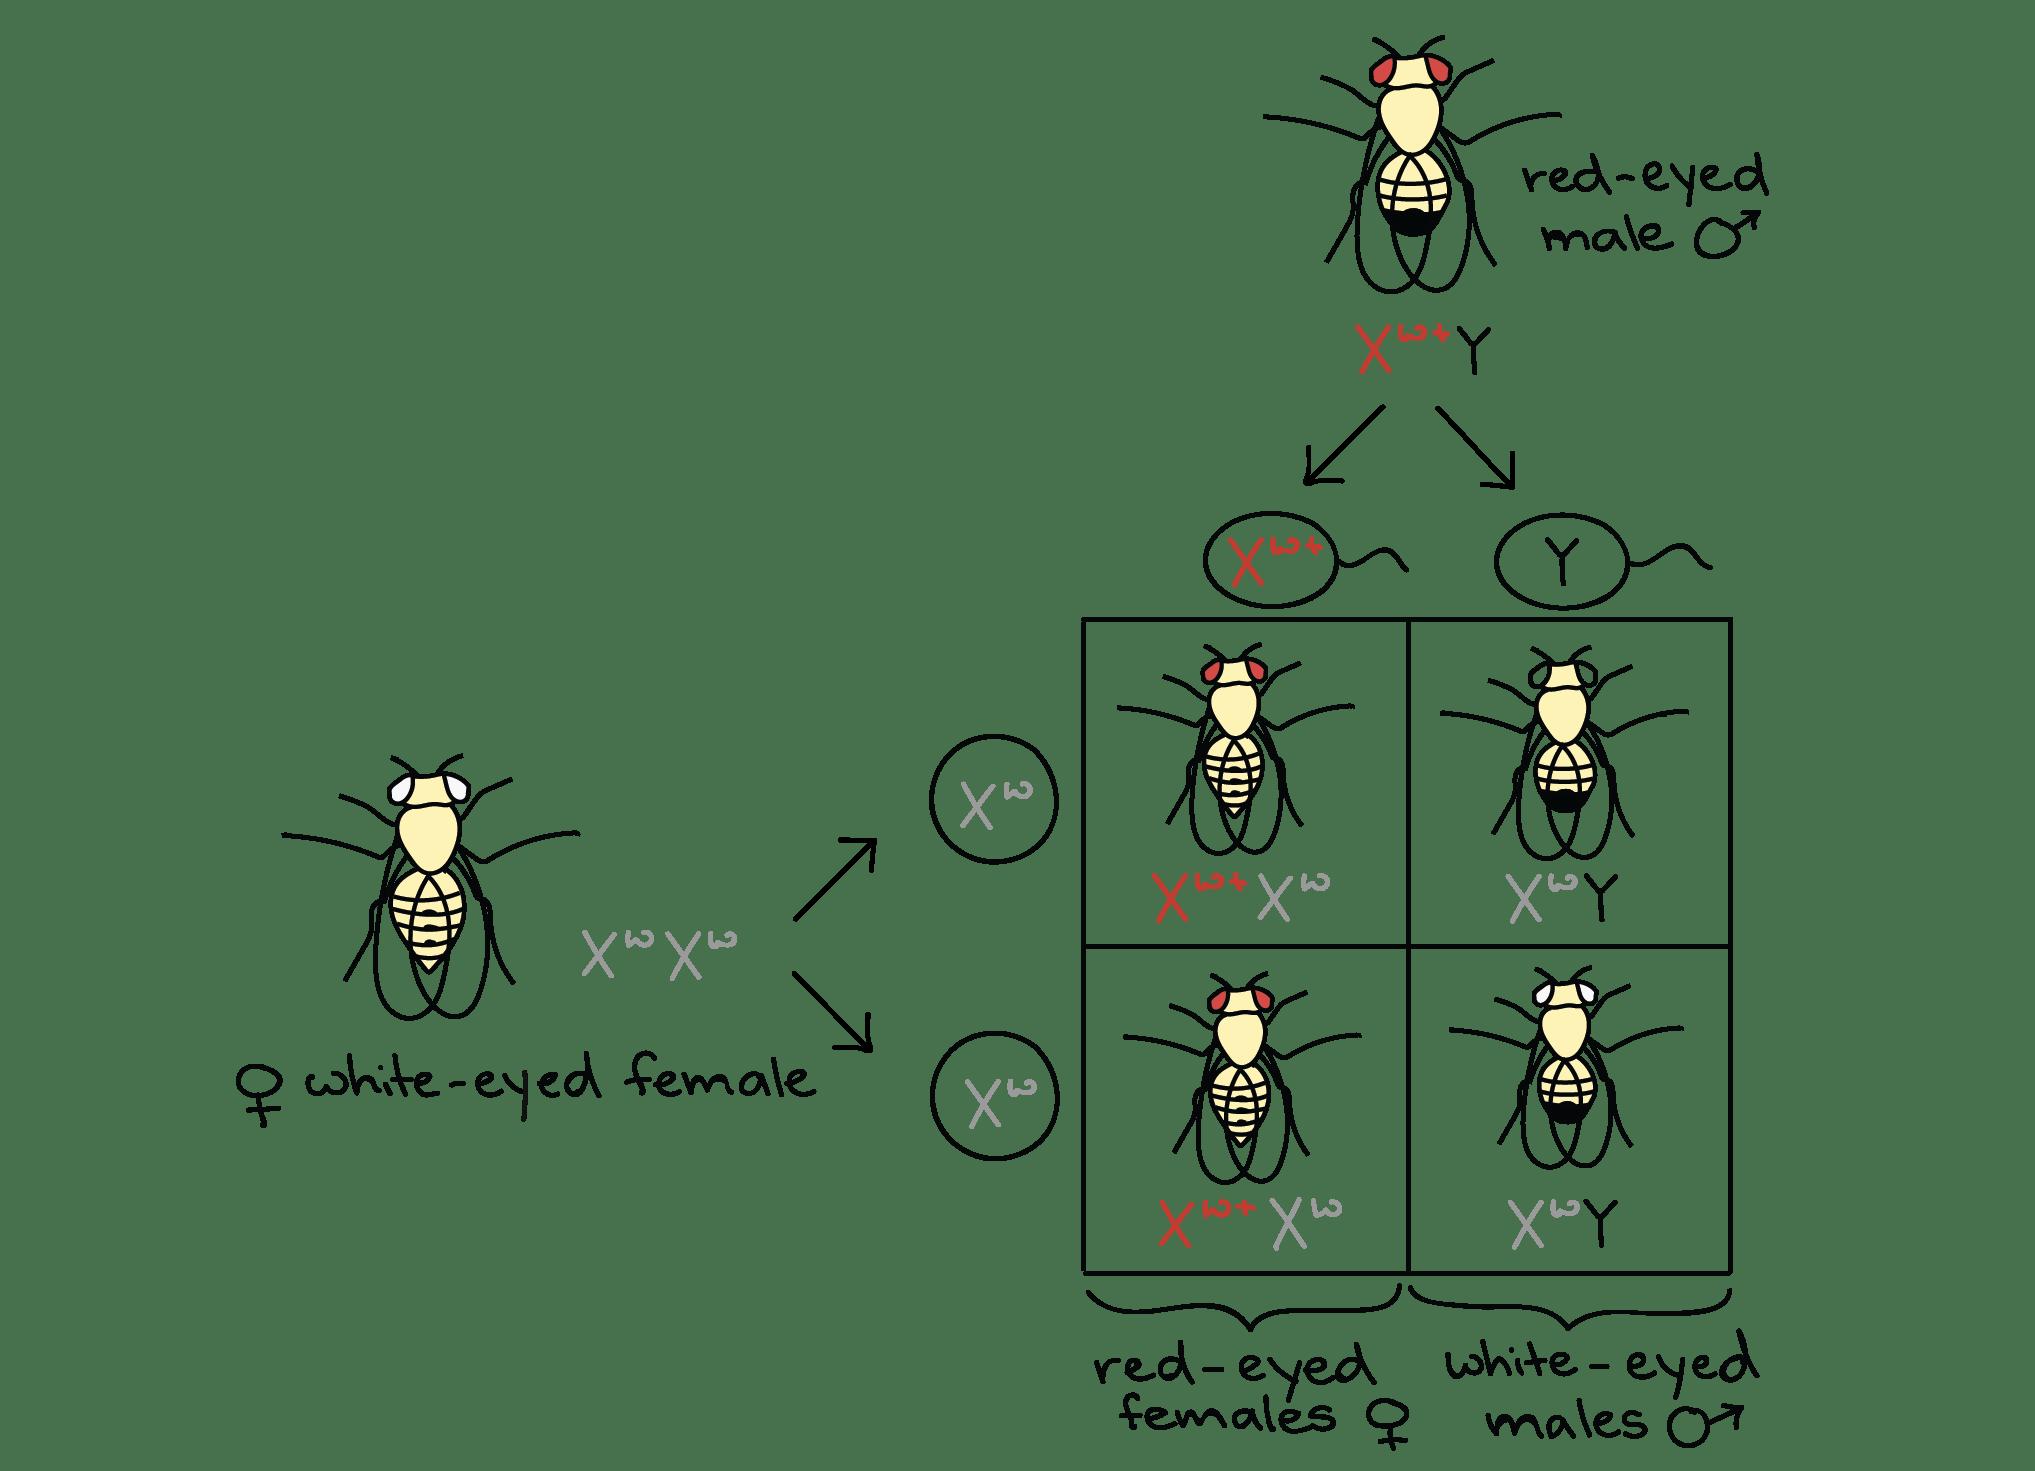 Mcq On Genetic Basis Of Inheritance Mcq Test Molecular Basis Of Inheritance Neet Notes